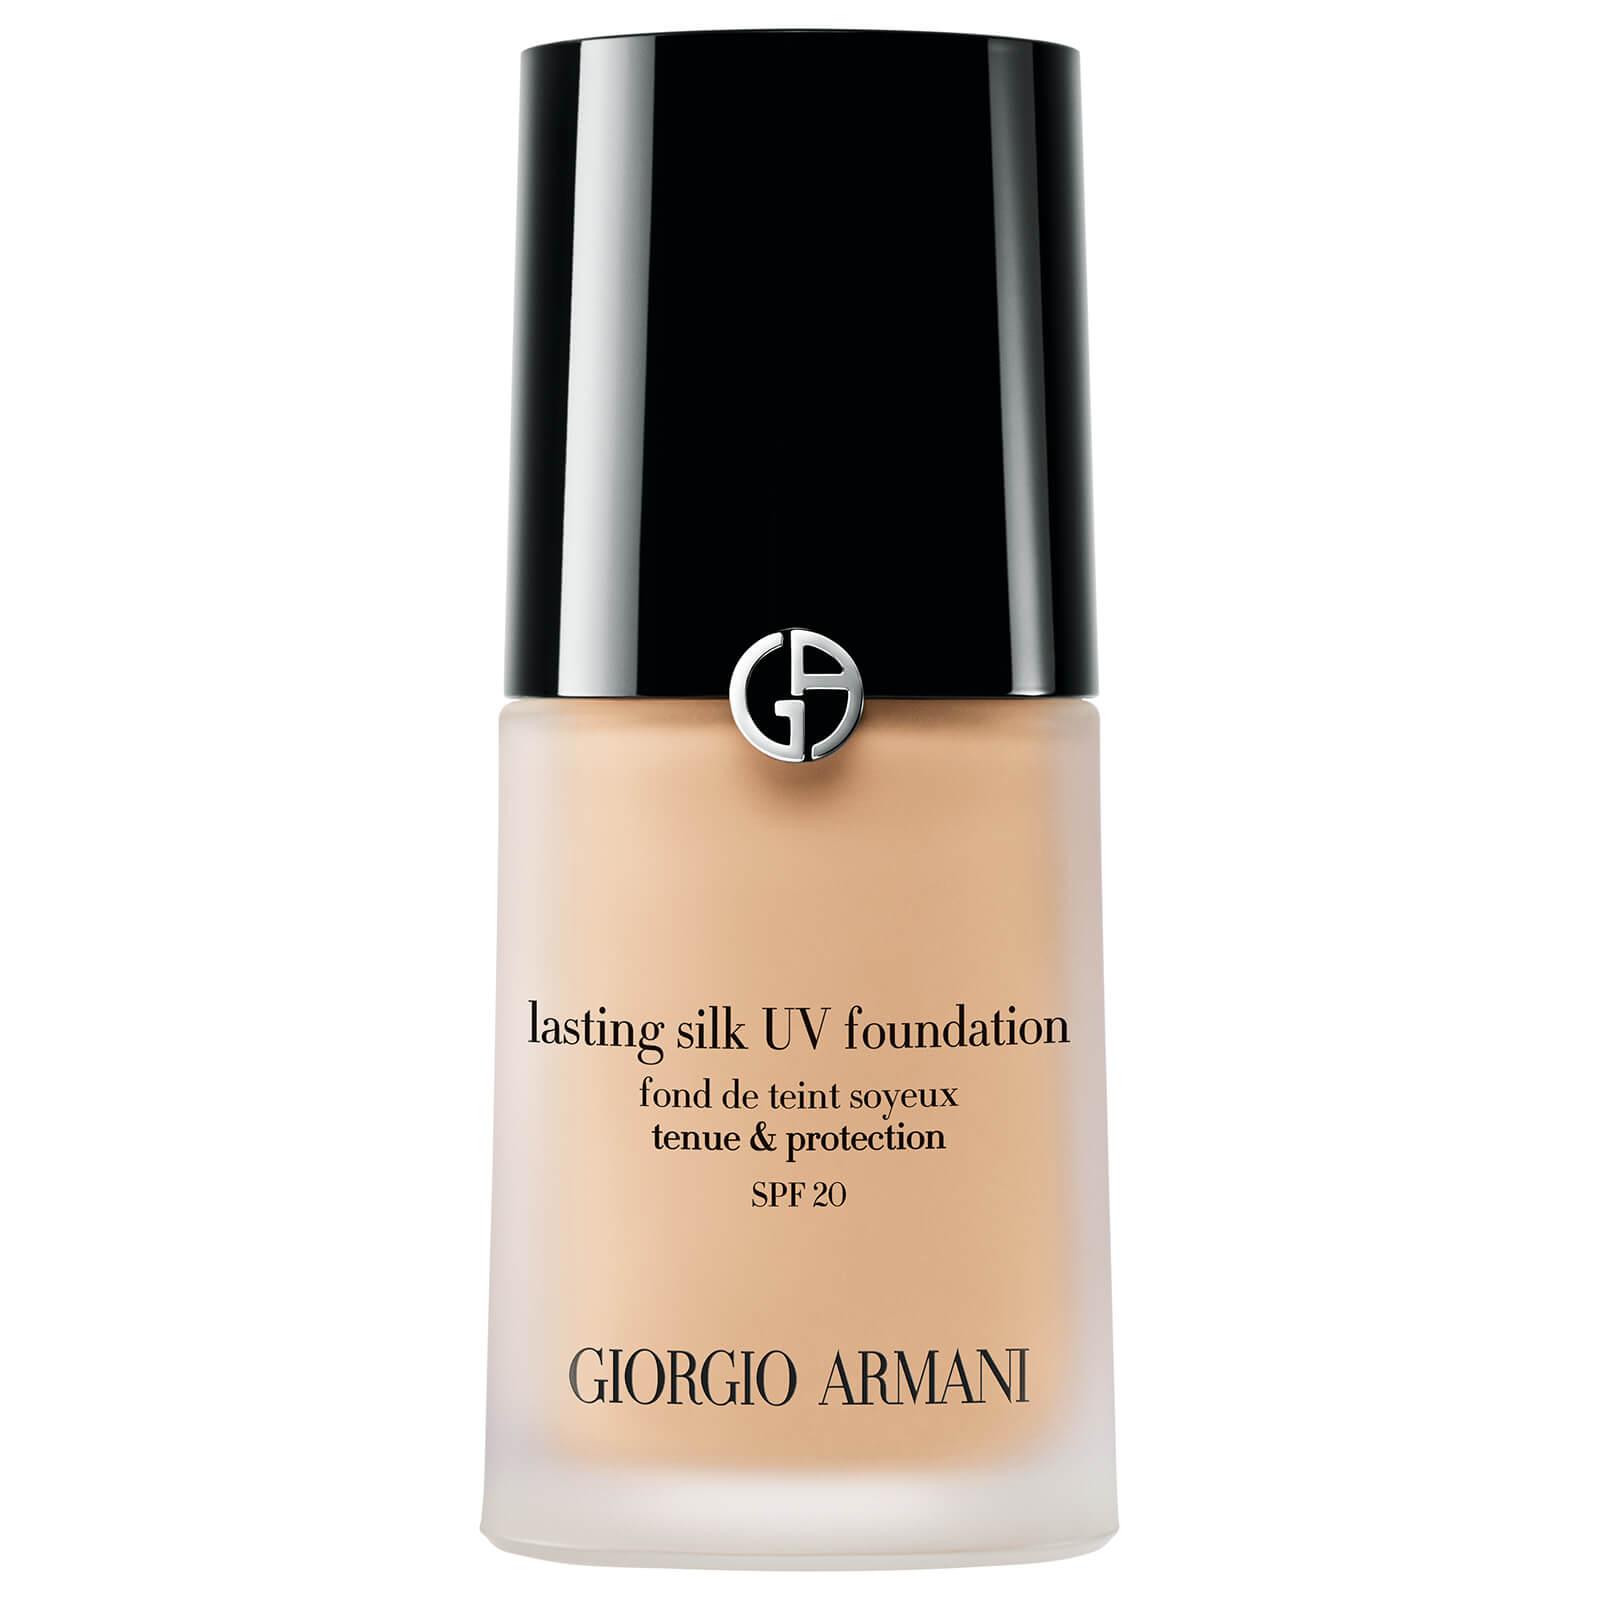 Armani Lasting Silk UV Foundation 30ml (Various Shades) - 4